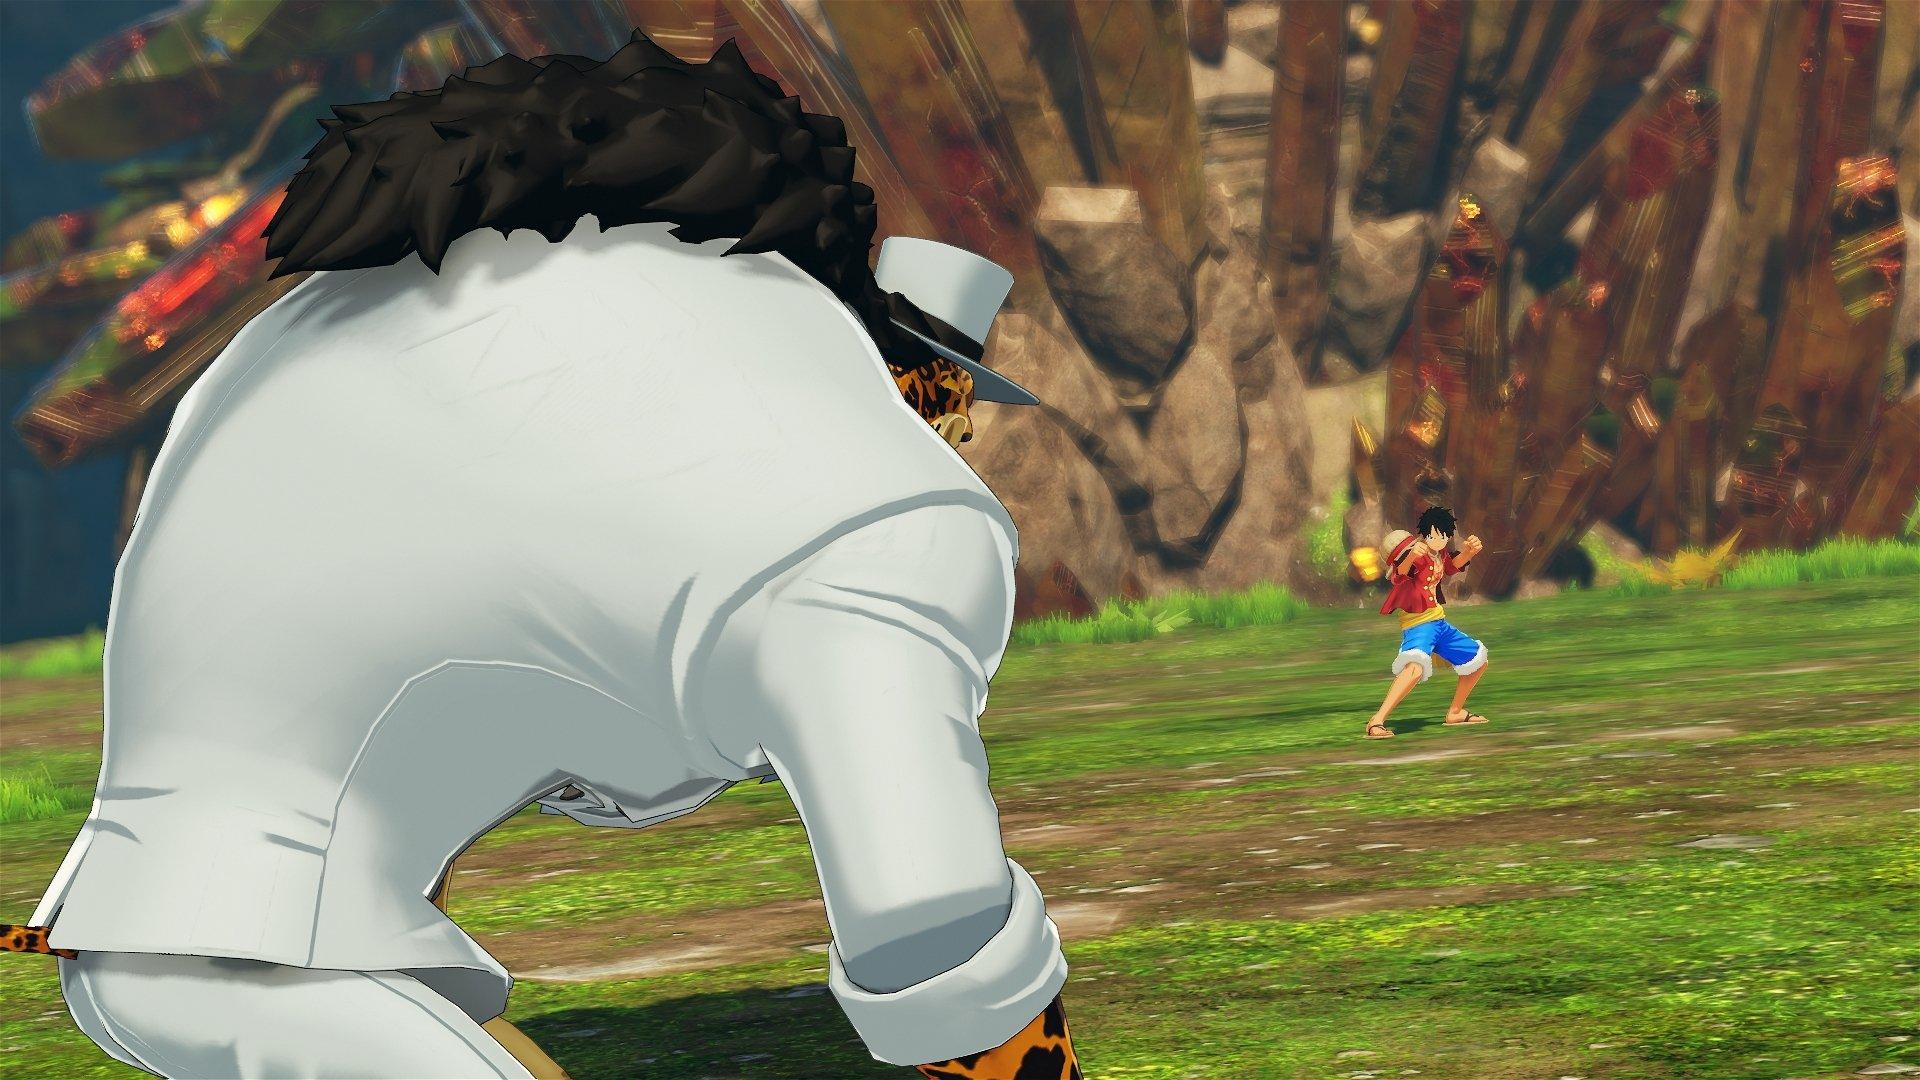 tokyo-game-show-mira-el-trailer-de-one-piece-world-seeker4-frikigamers.com